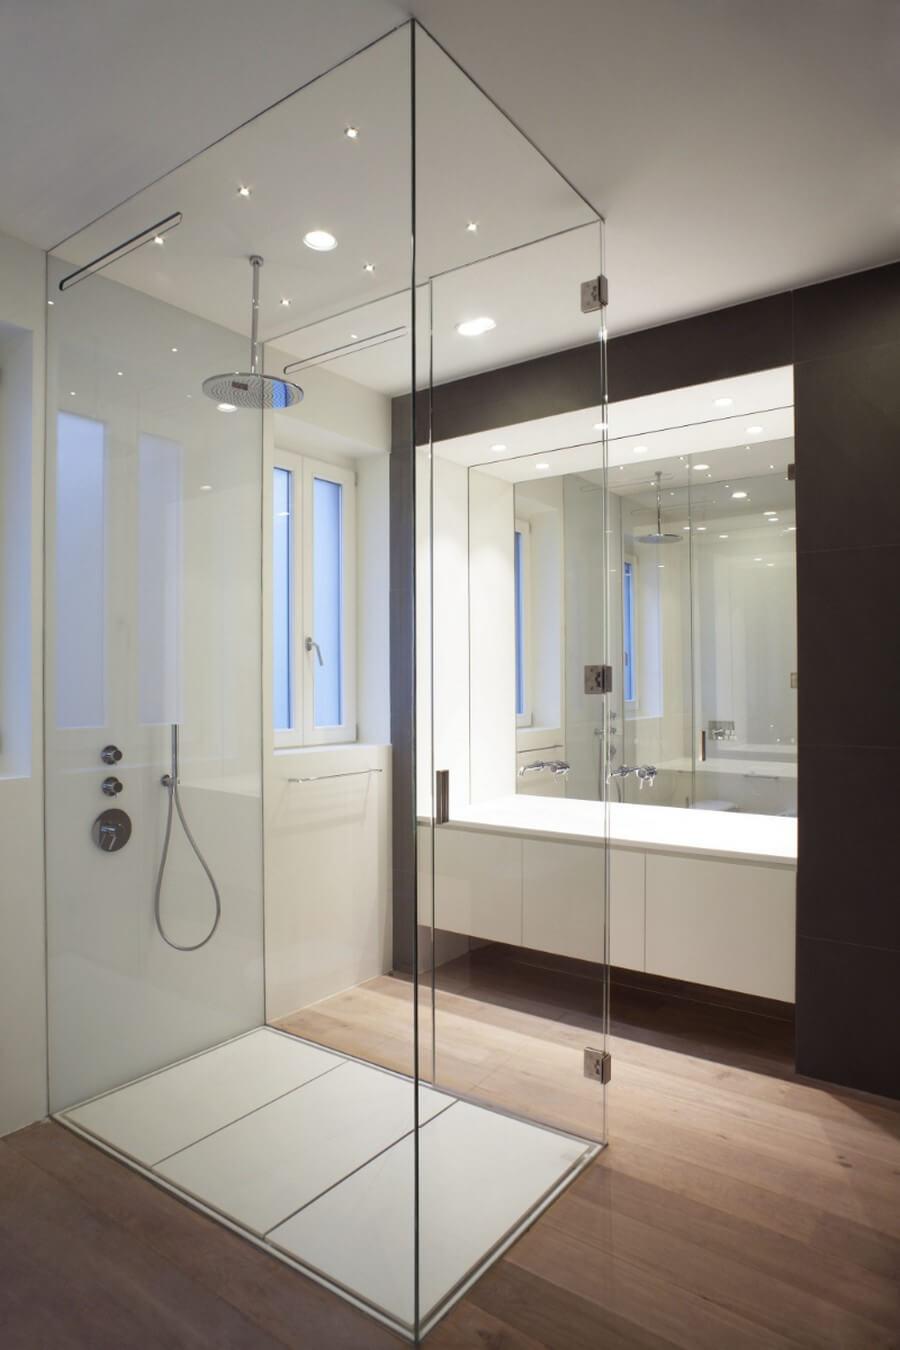 Timeless Bathroom Designs by AIM Studio aim studio Timeless Bathroom Designs by AIM Studio Timeless Bathroom Designs by AIM Studio 11